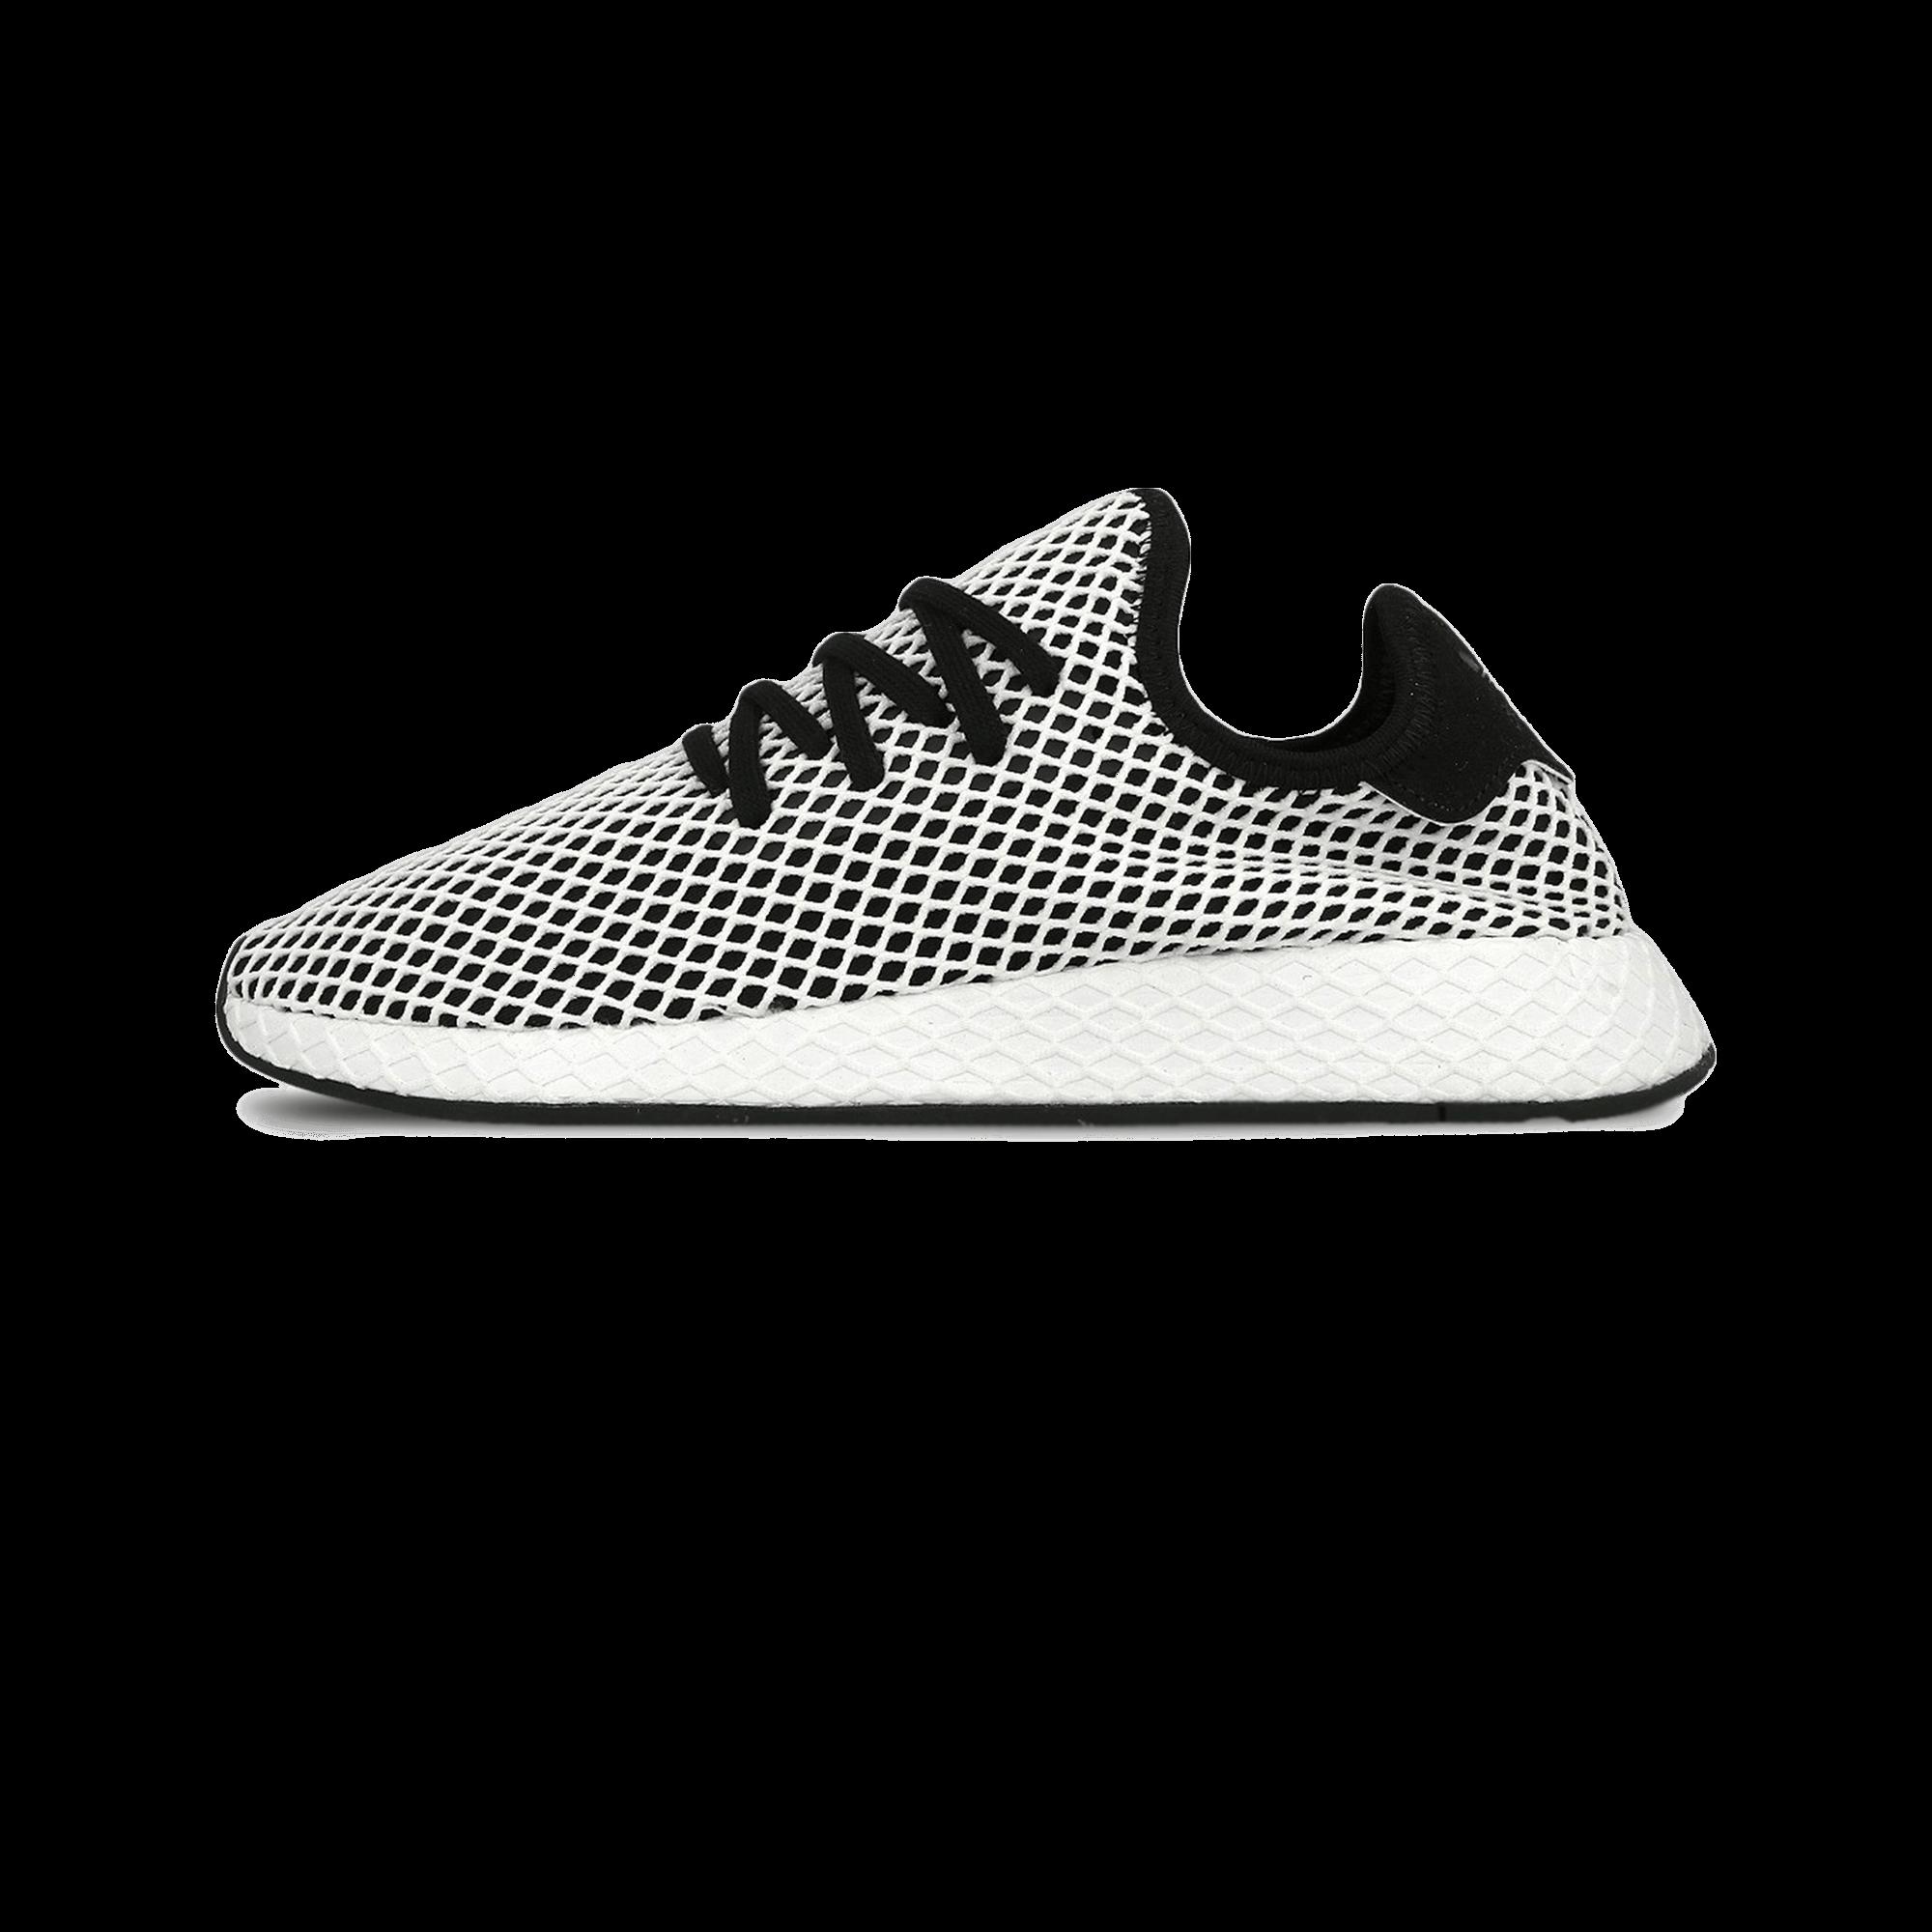 adidas Deerupt Runner core black white Men |